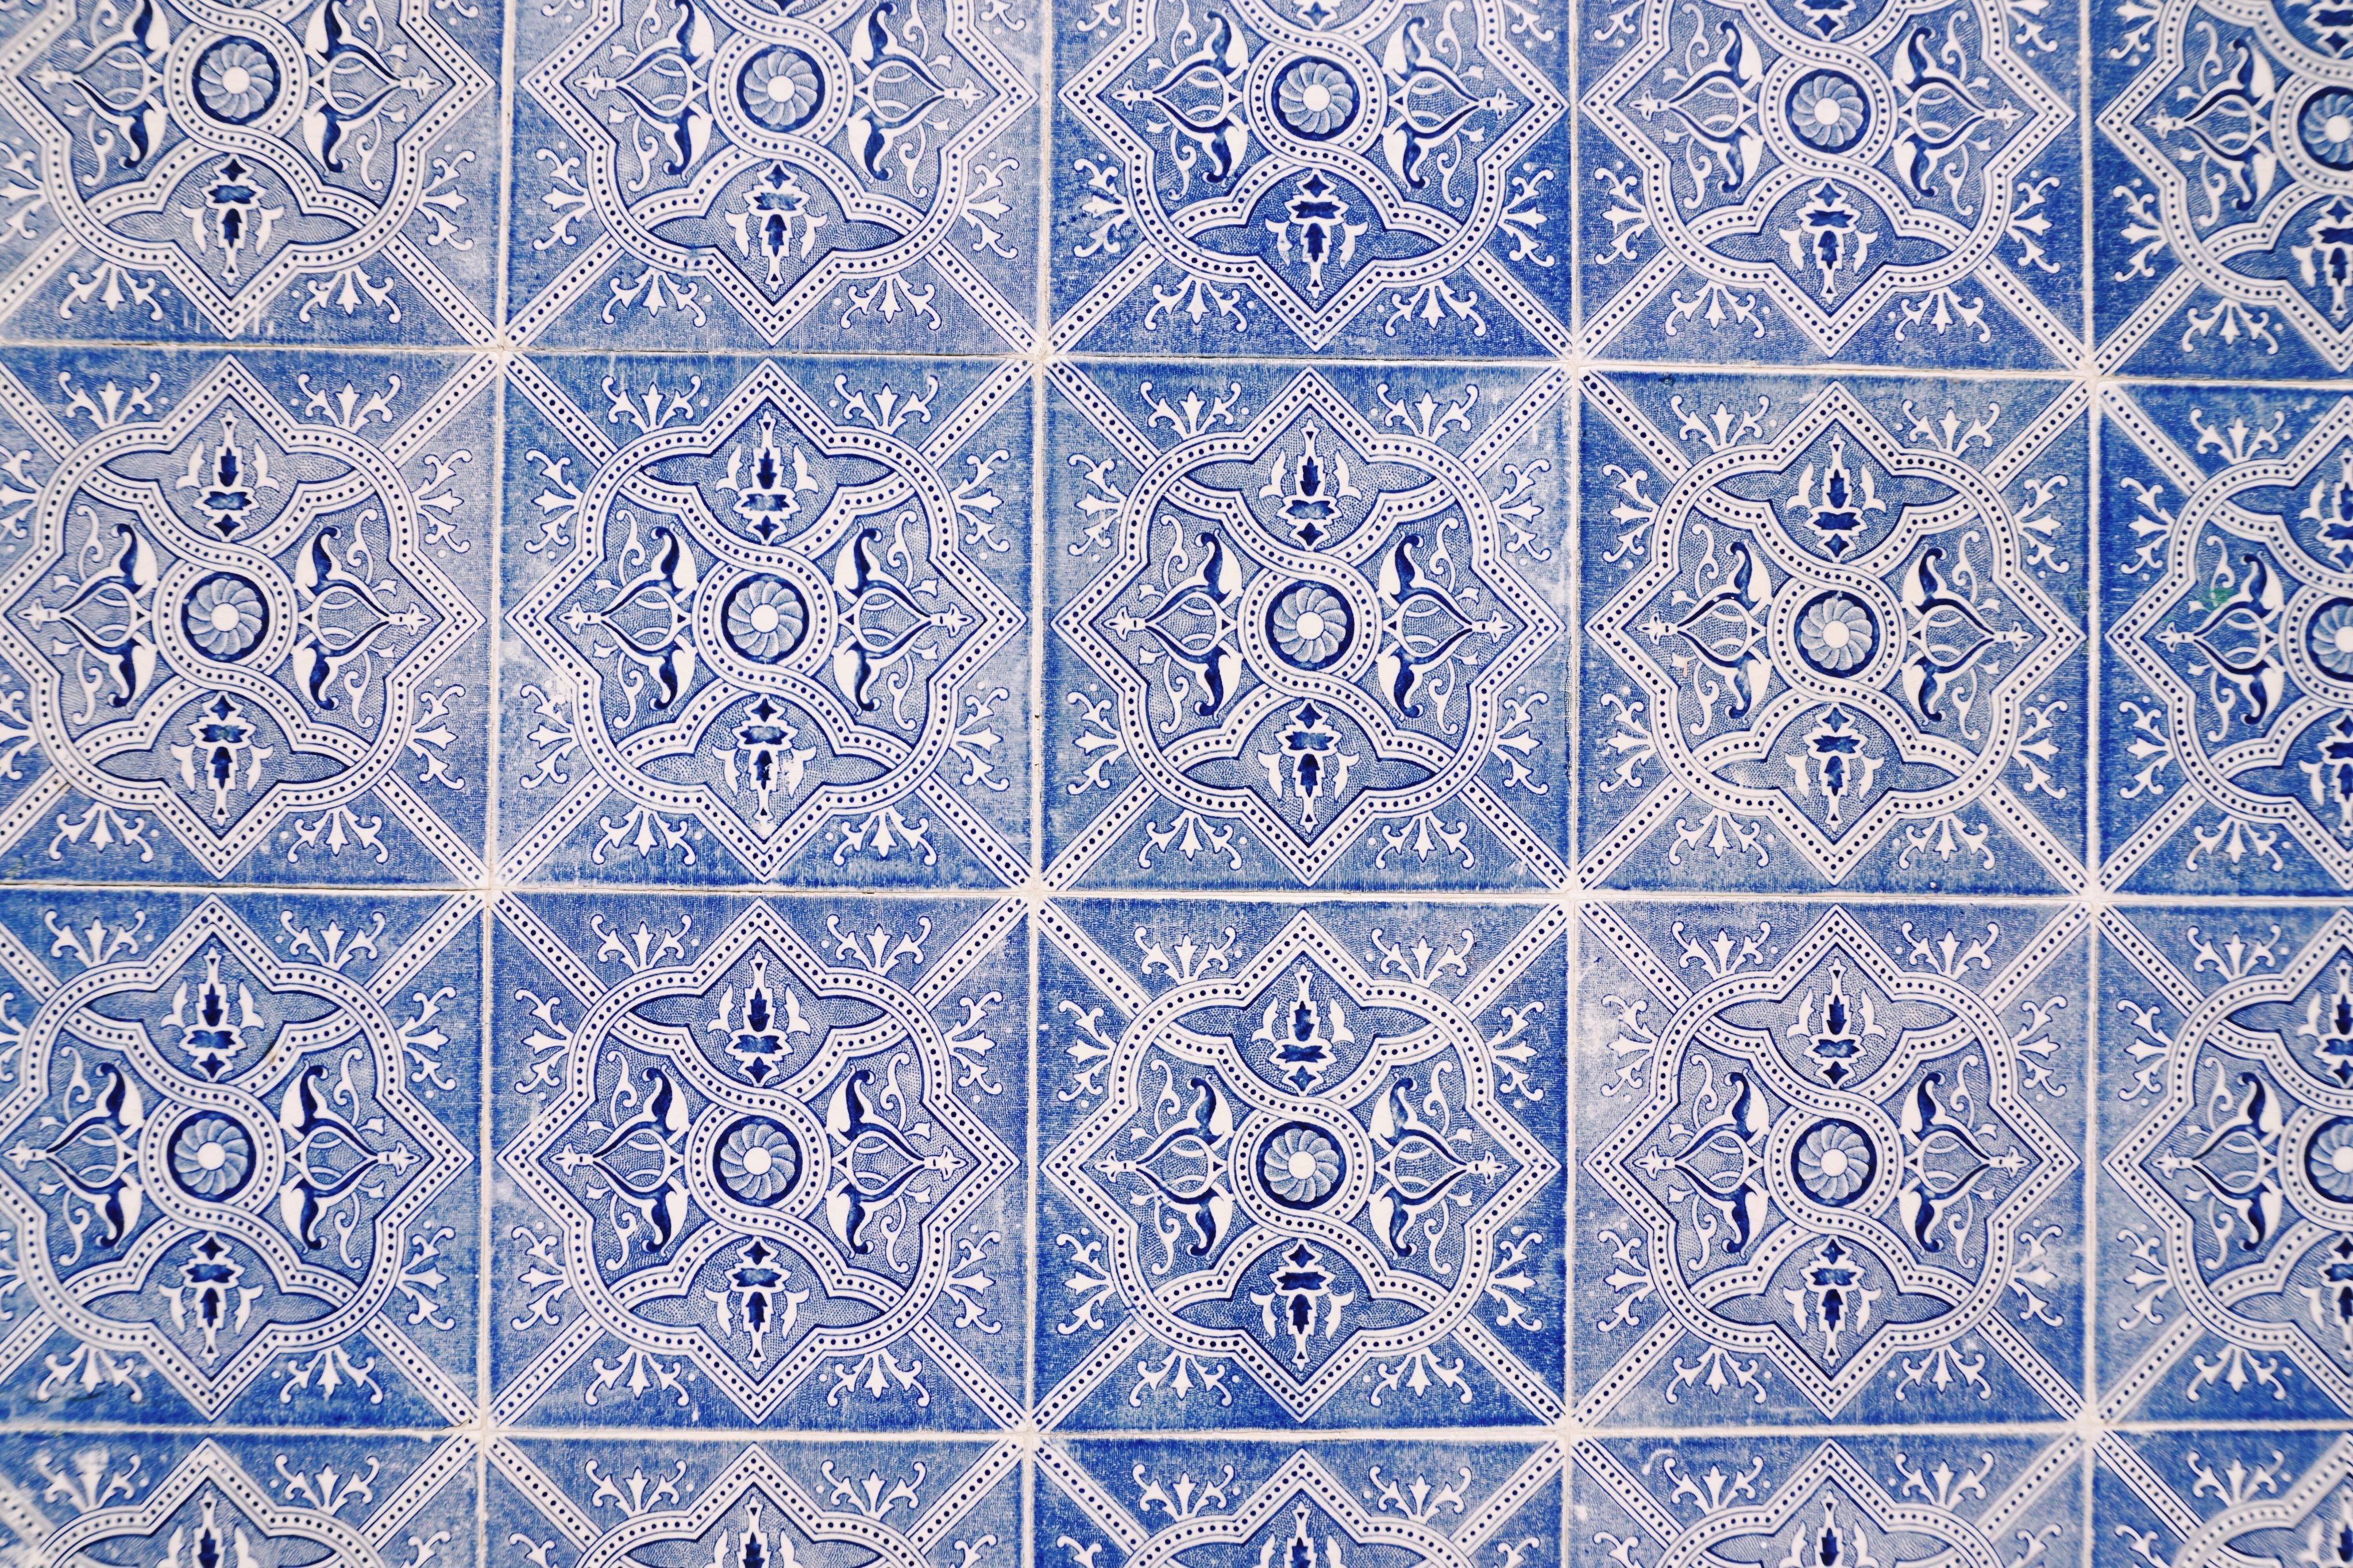 Traditional Portuguese tiles. Azulejos in the Algarve